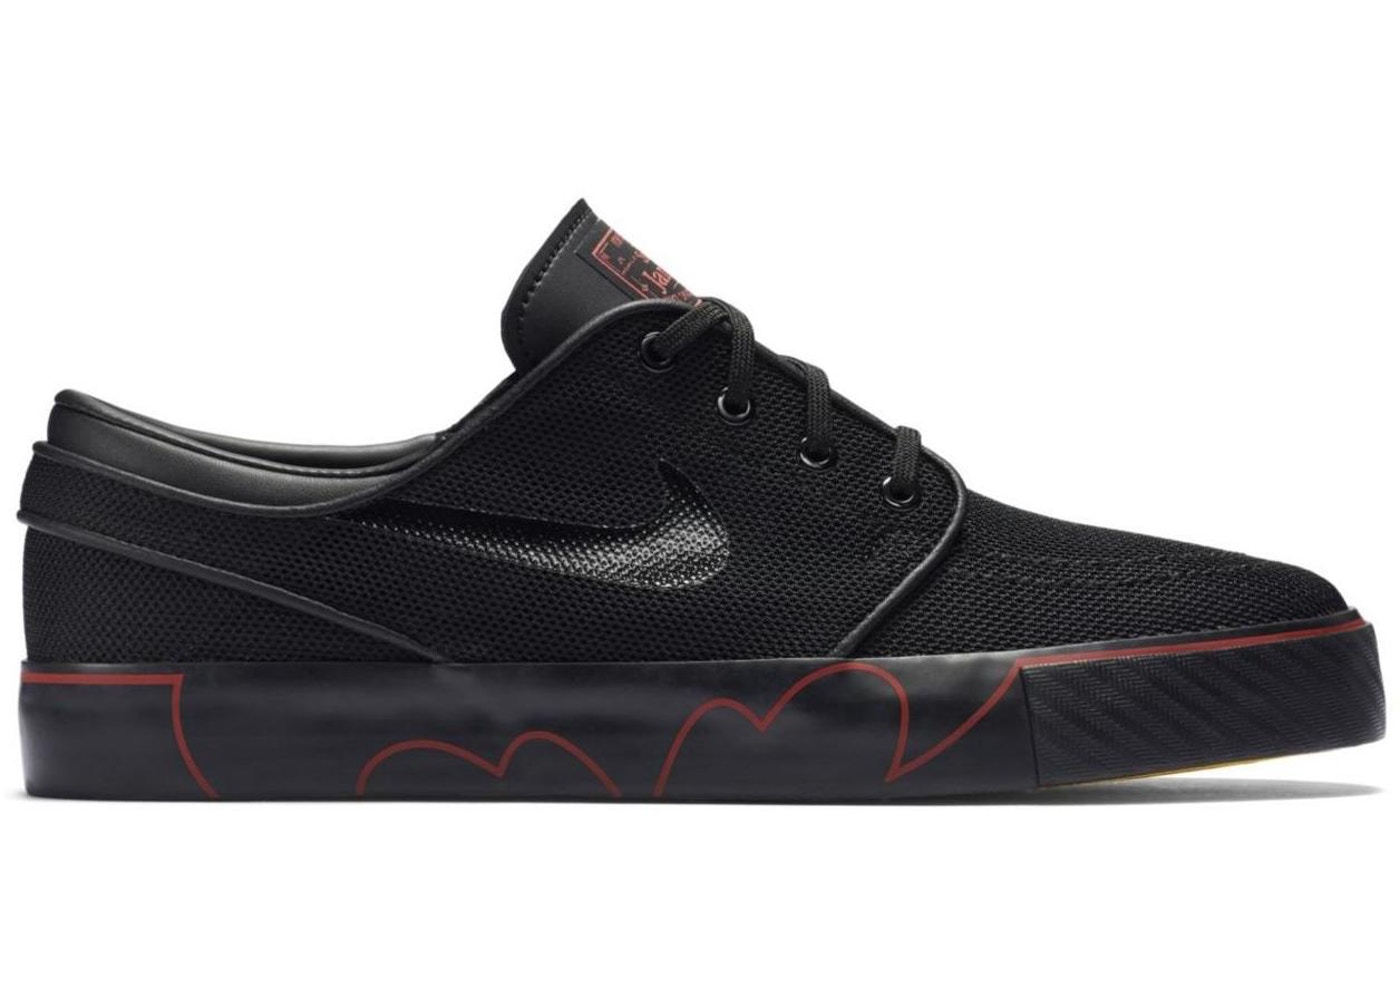 newest 8463a 021de Nike SB Stefan Janoski Doernbecher (2015) - 642180-006